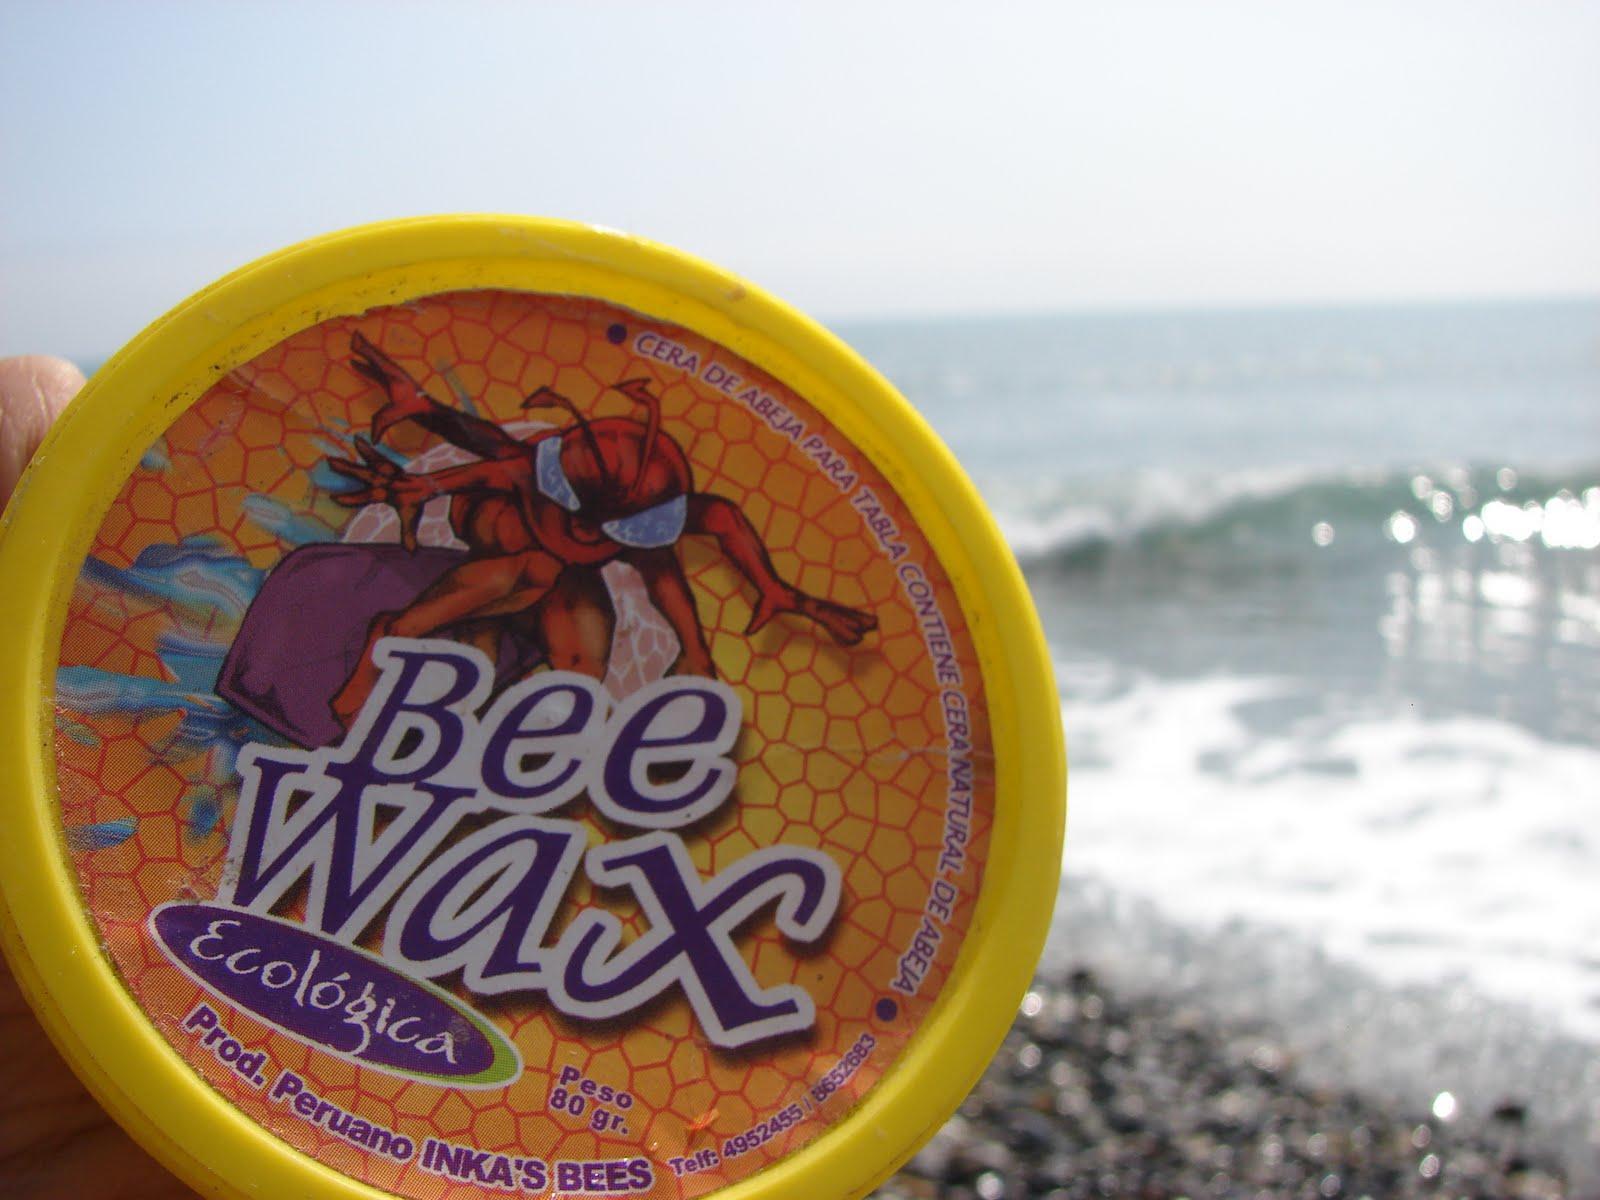 2-marzo-3-4-5-6-7...2012...BEE WAX la cera Peruana k te Agarra.x Fito.33.p.